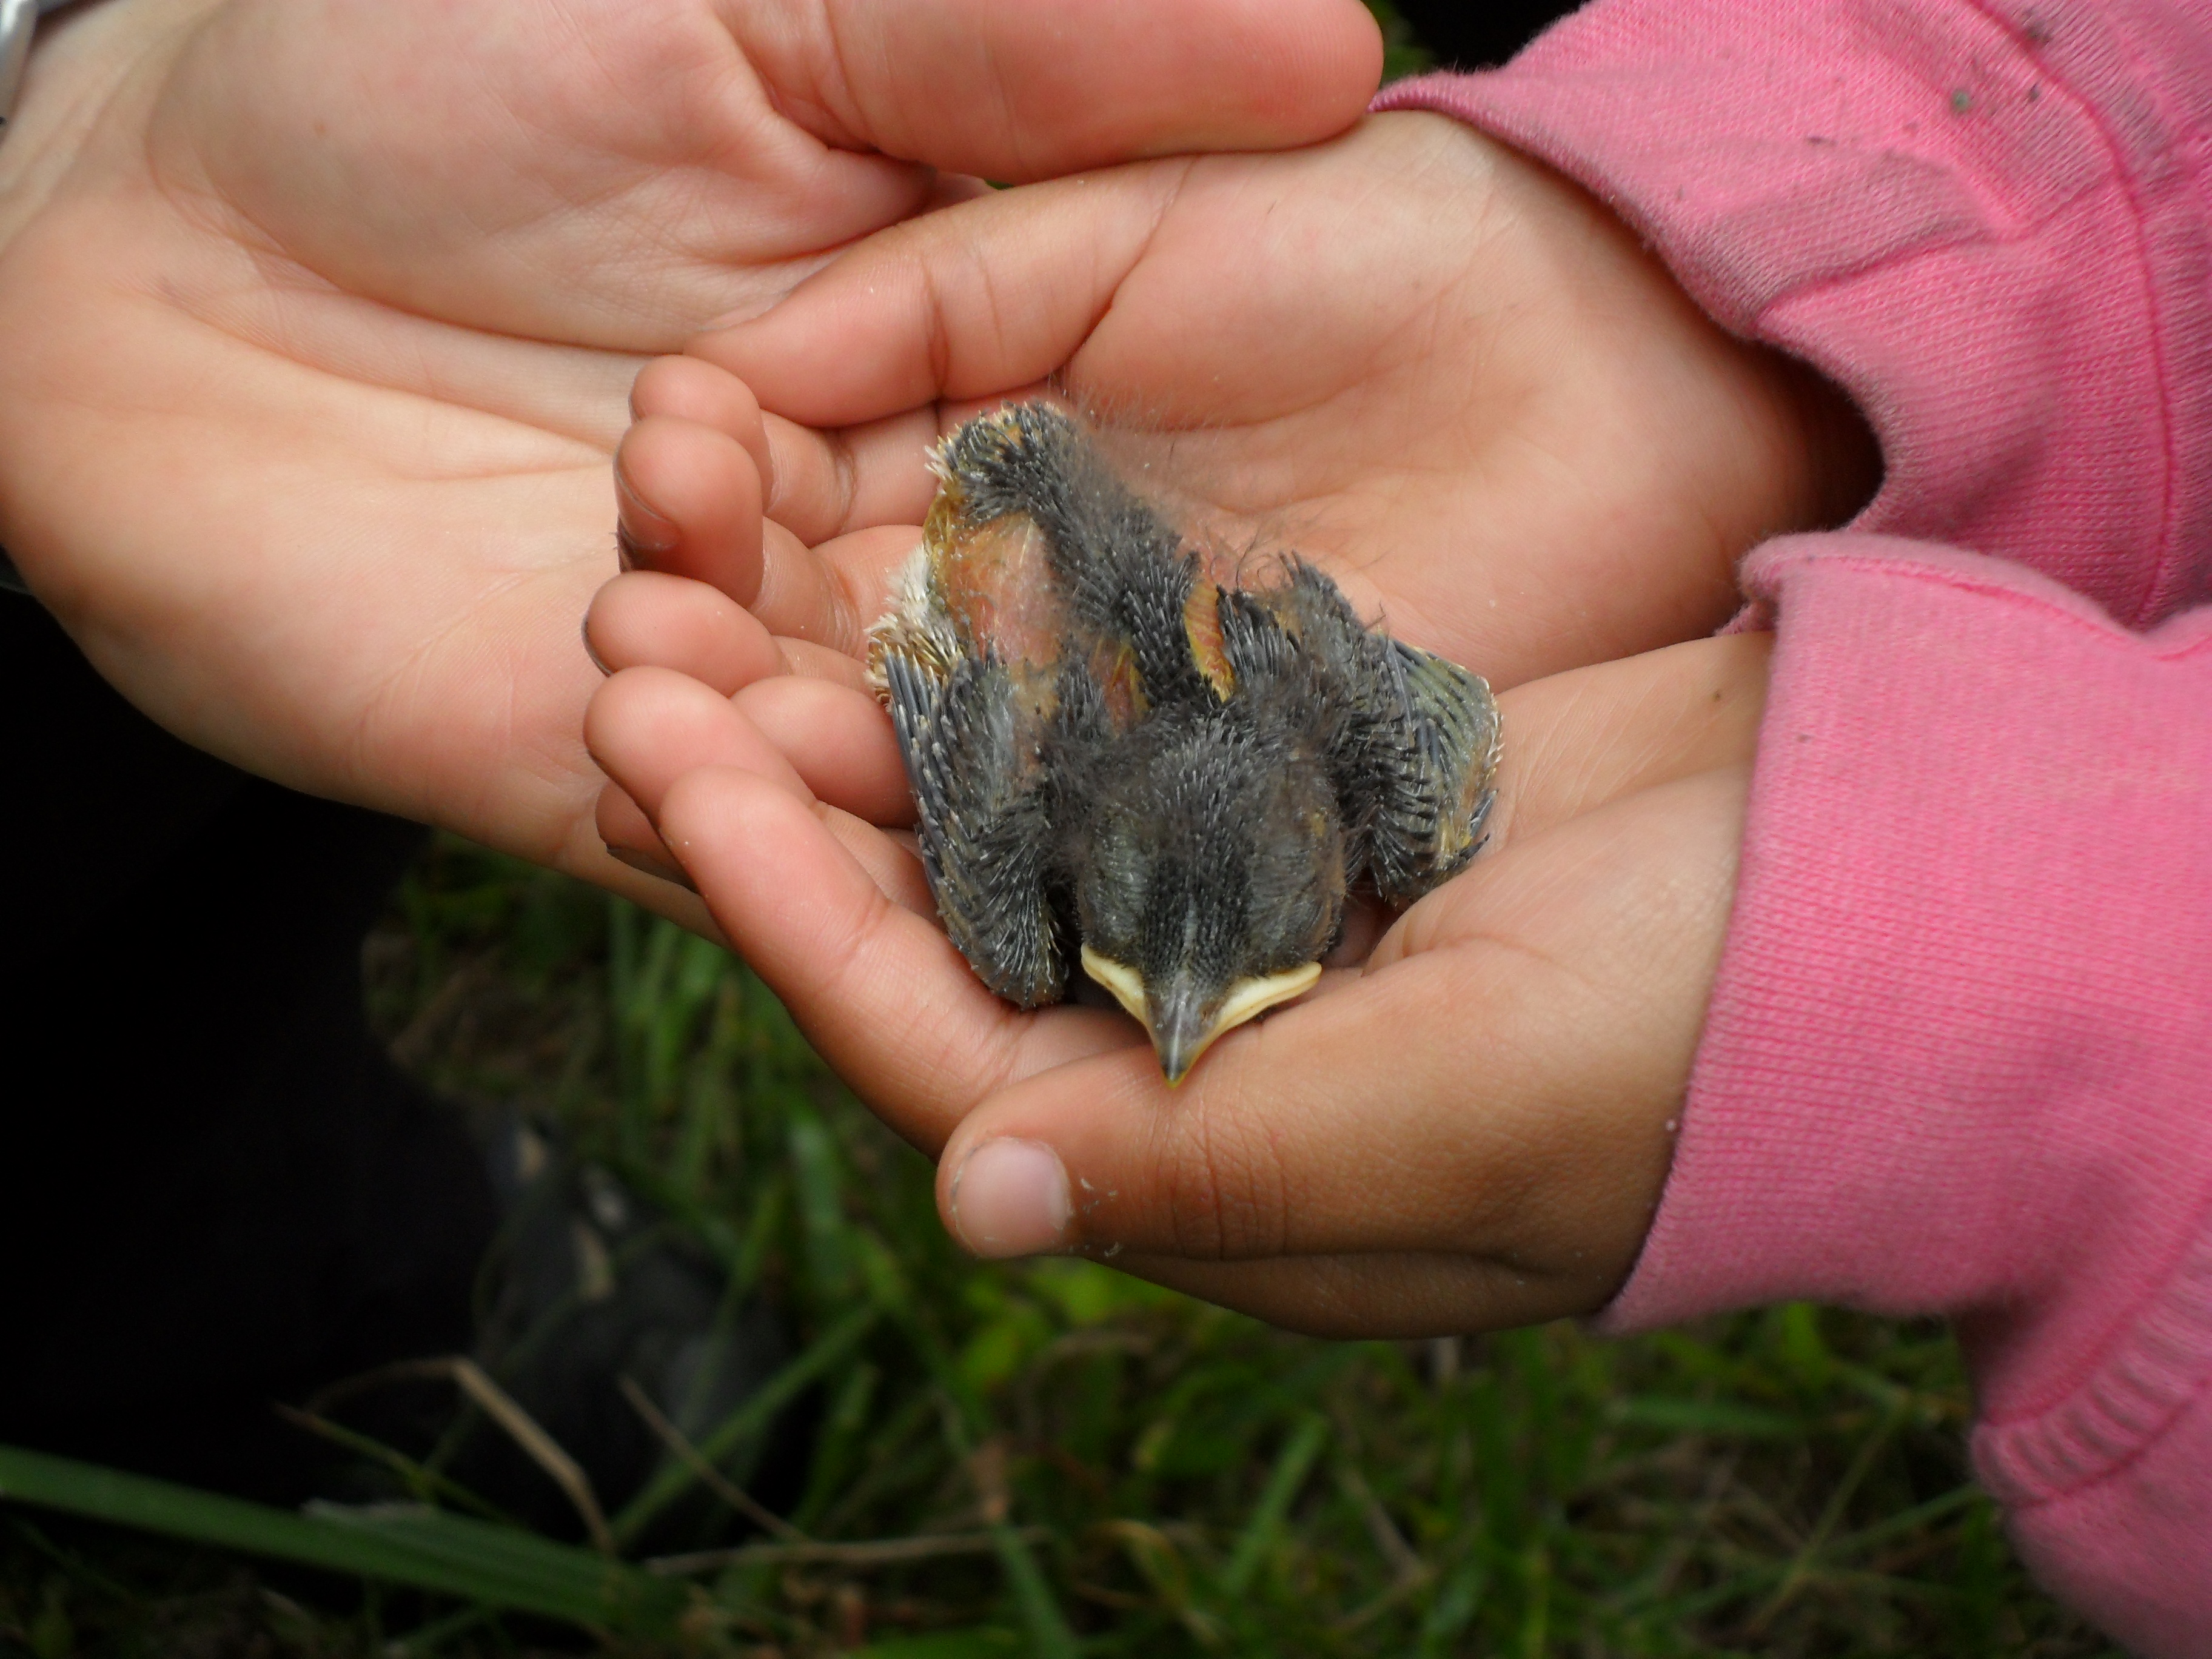 Child with baby bird.